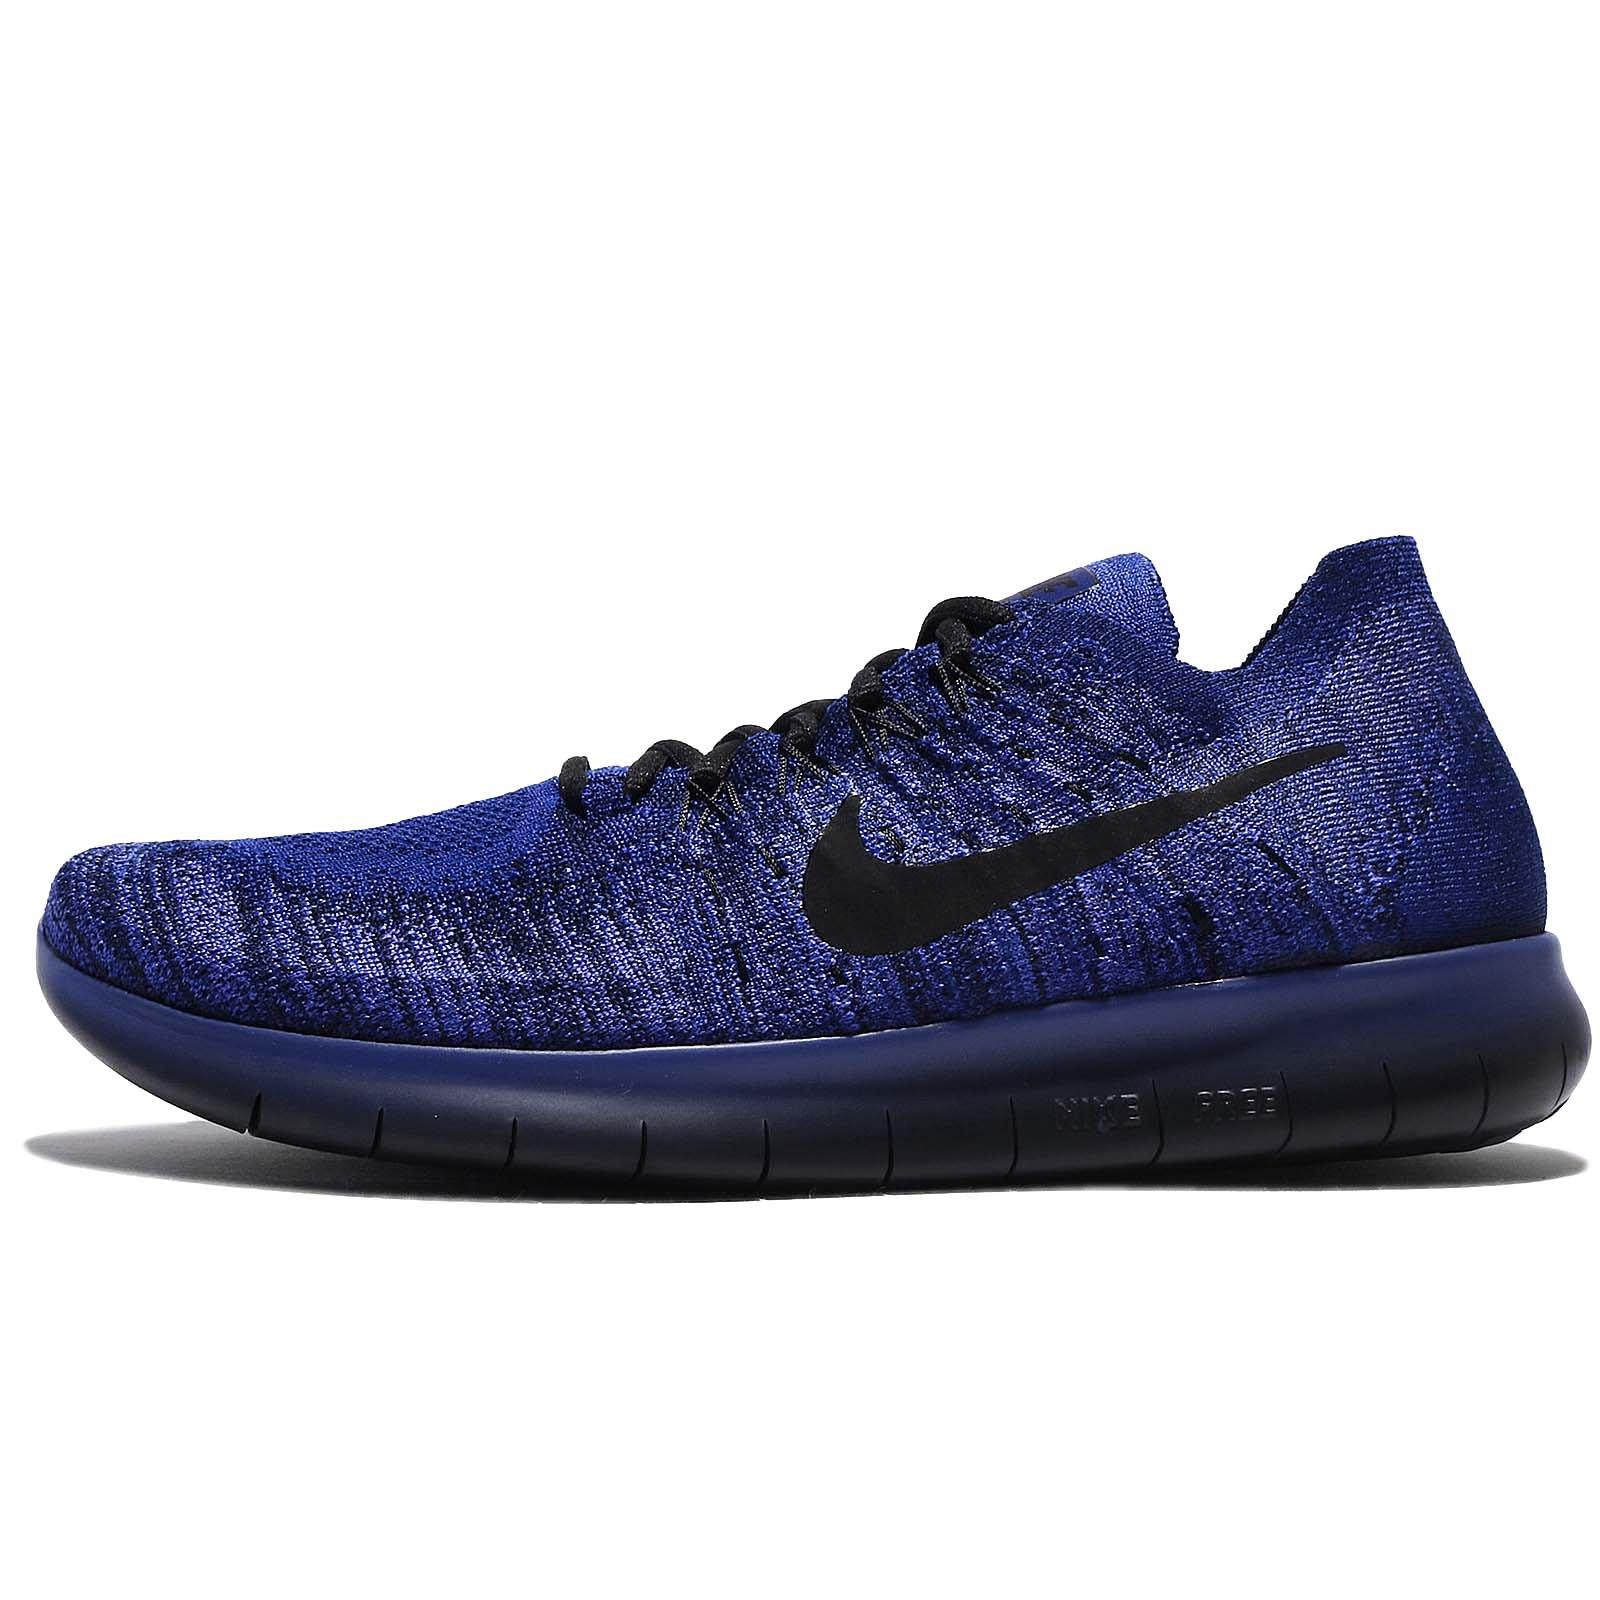 Galleon - Nike Free RN Flyknit 2017 880843 406 Deep Royal Blue/Black ...